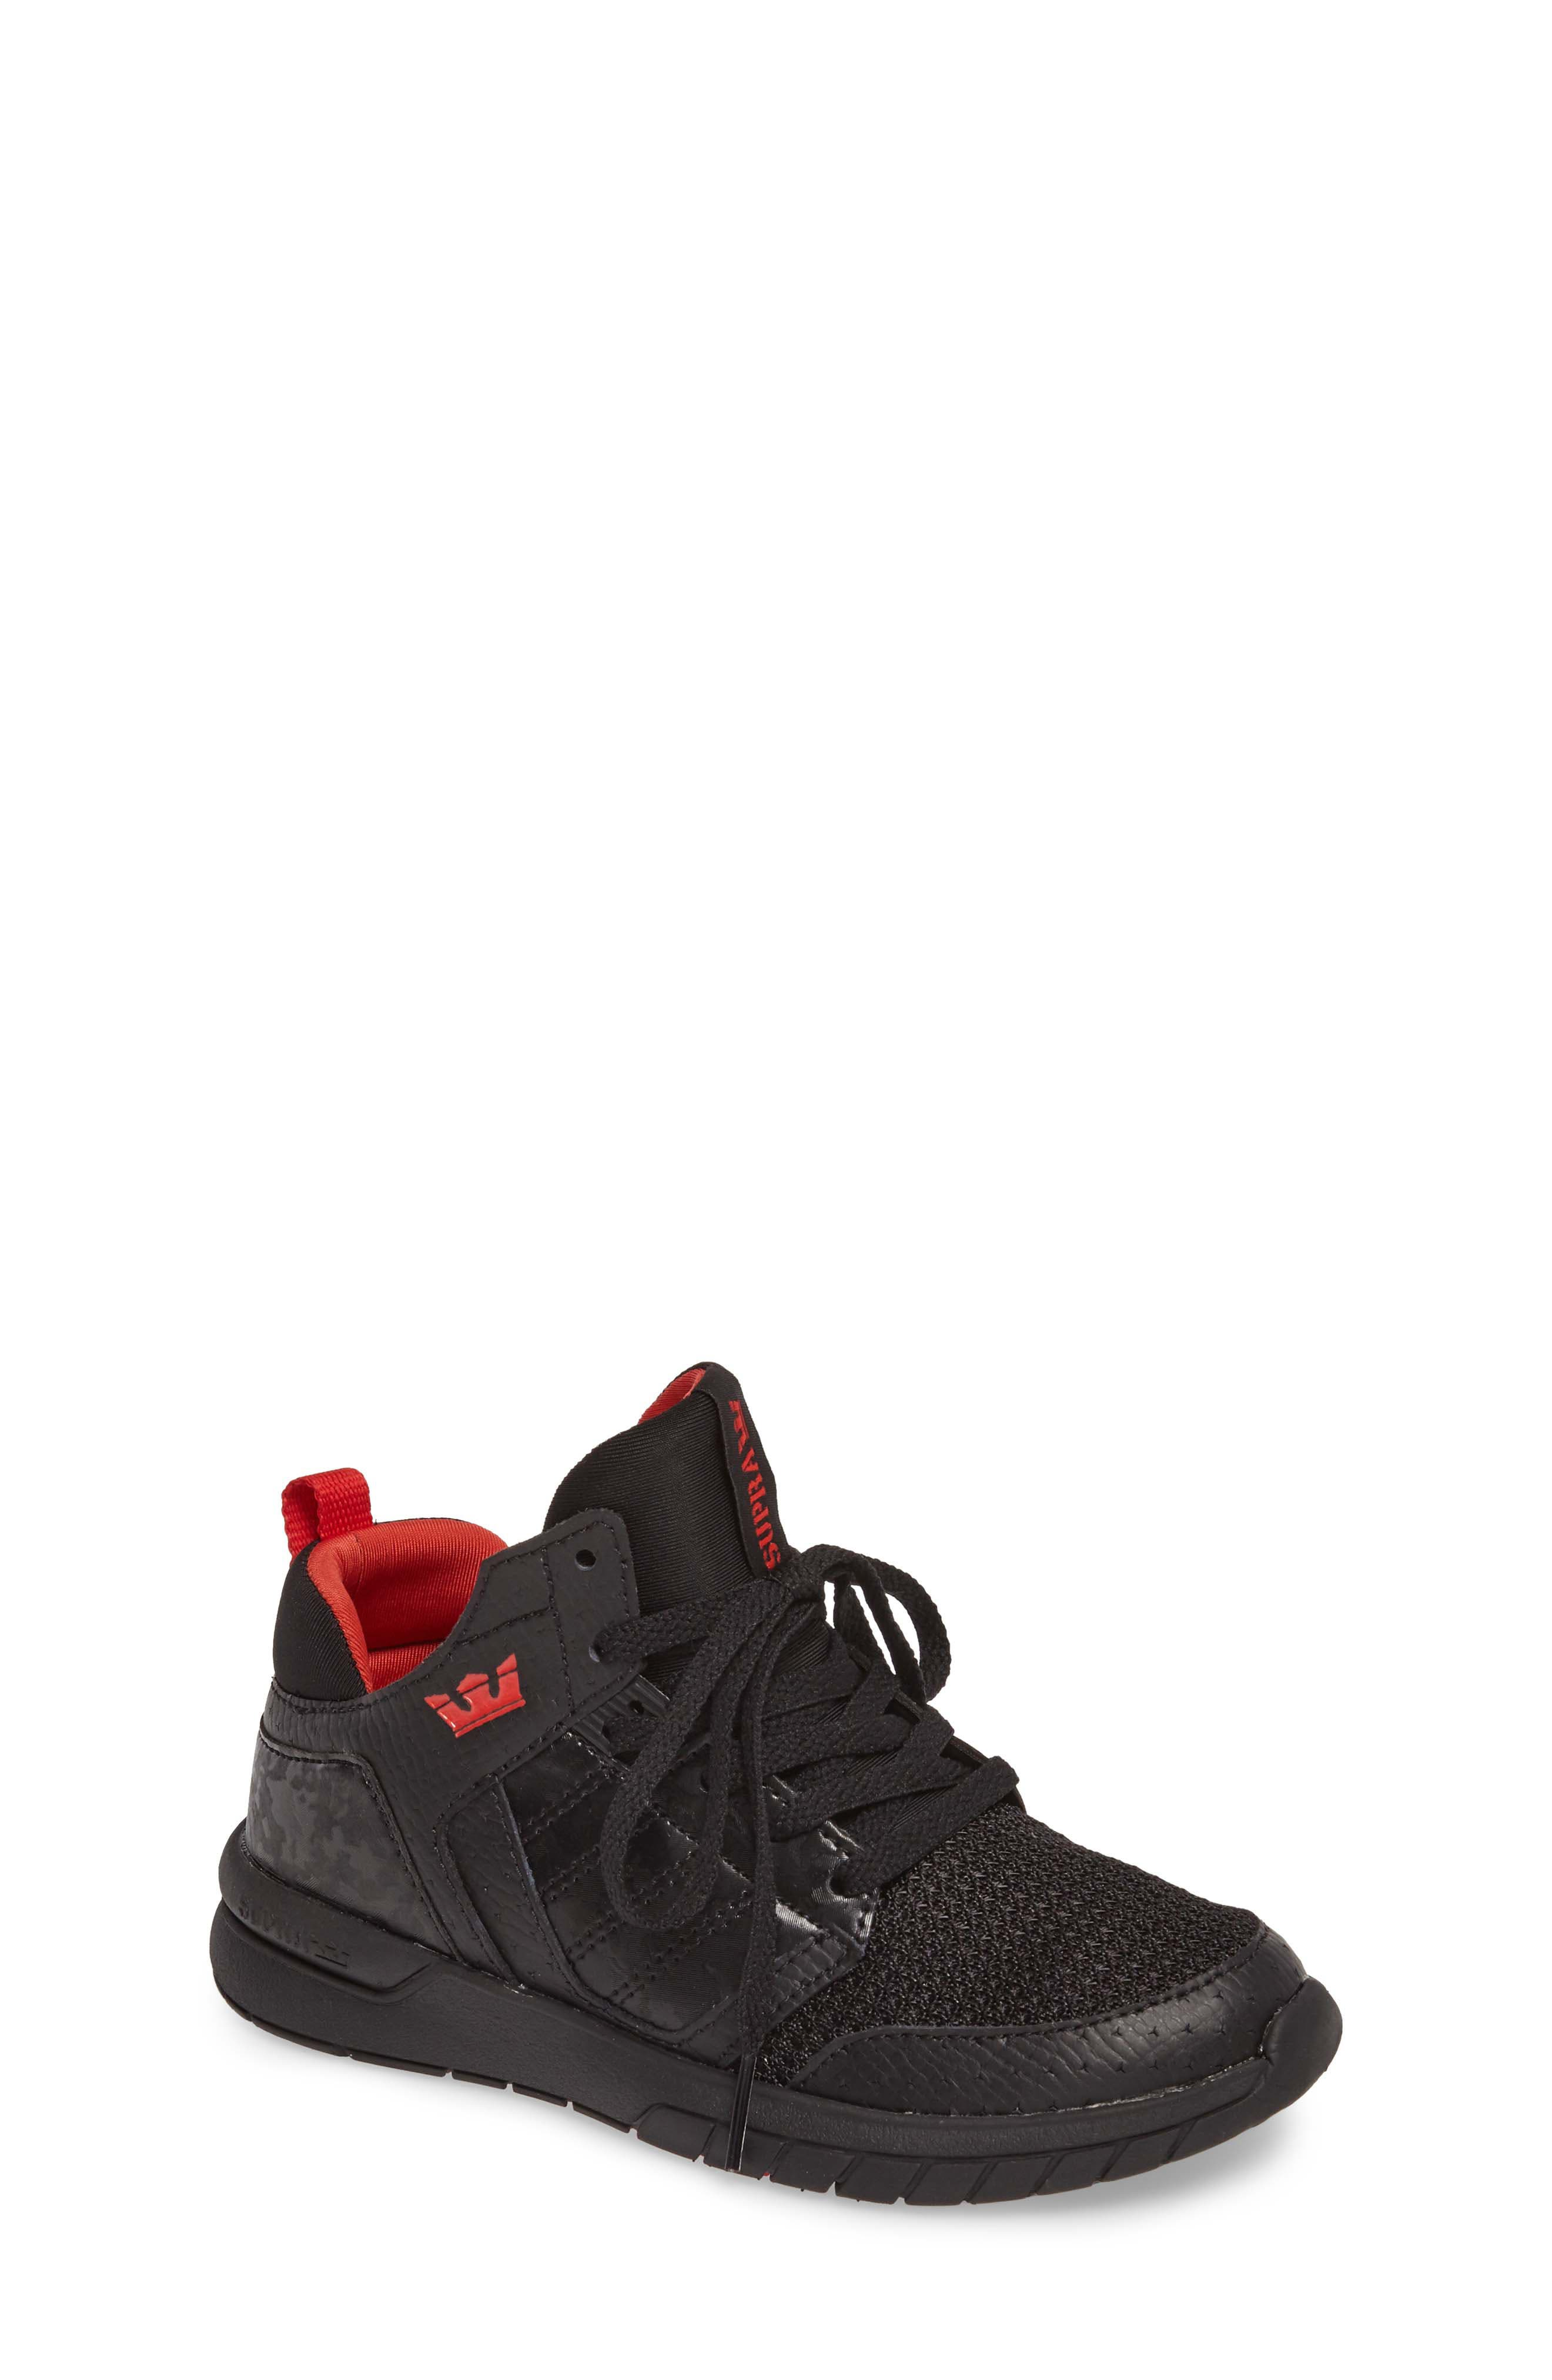 Method Sneaker,                             Main thumbnail 1, color,                             001